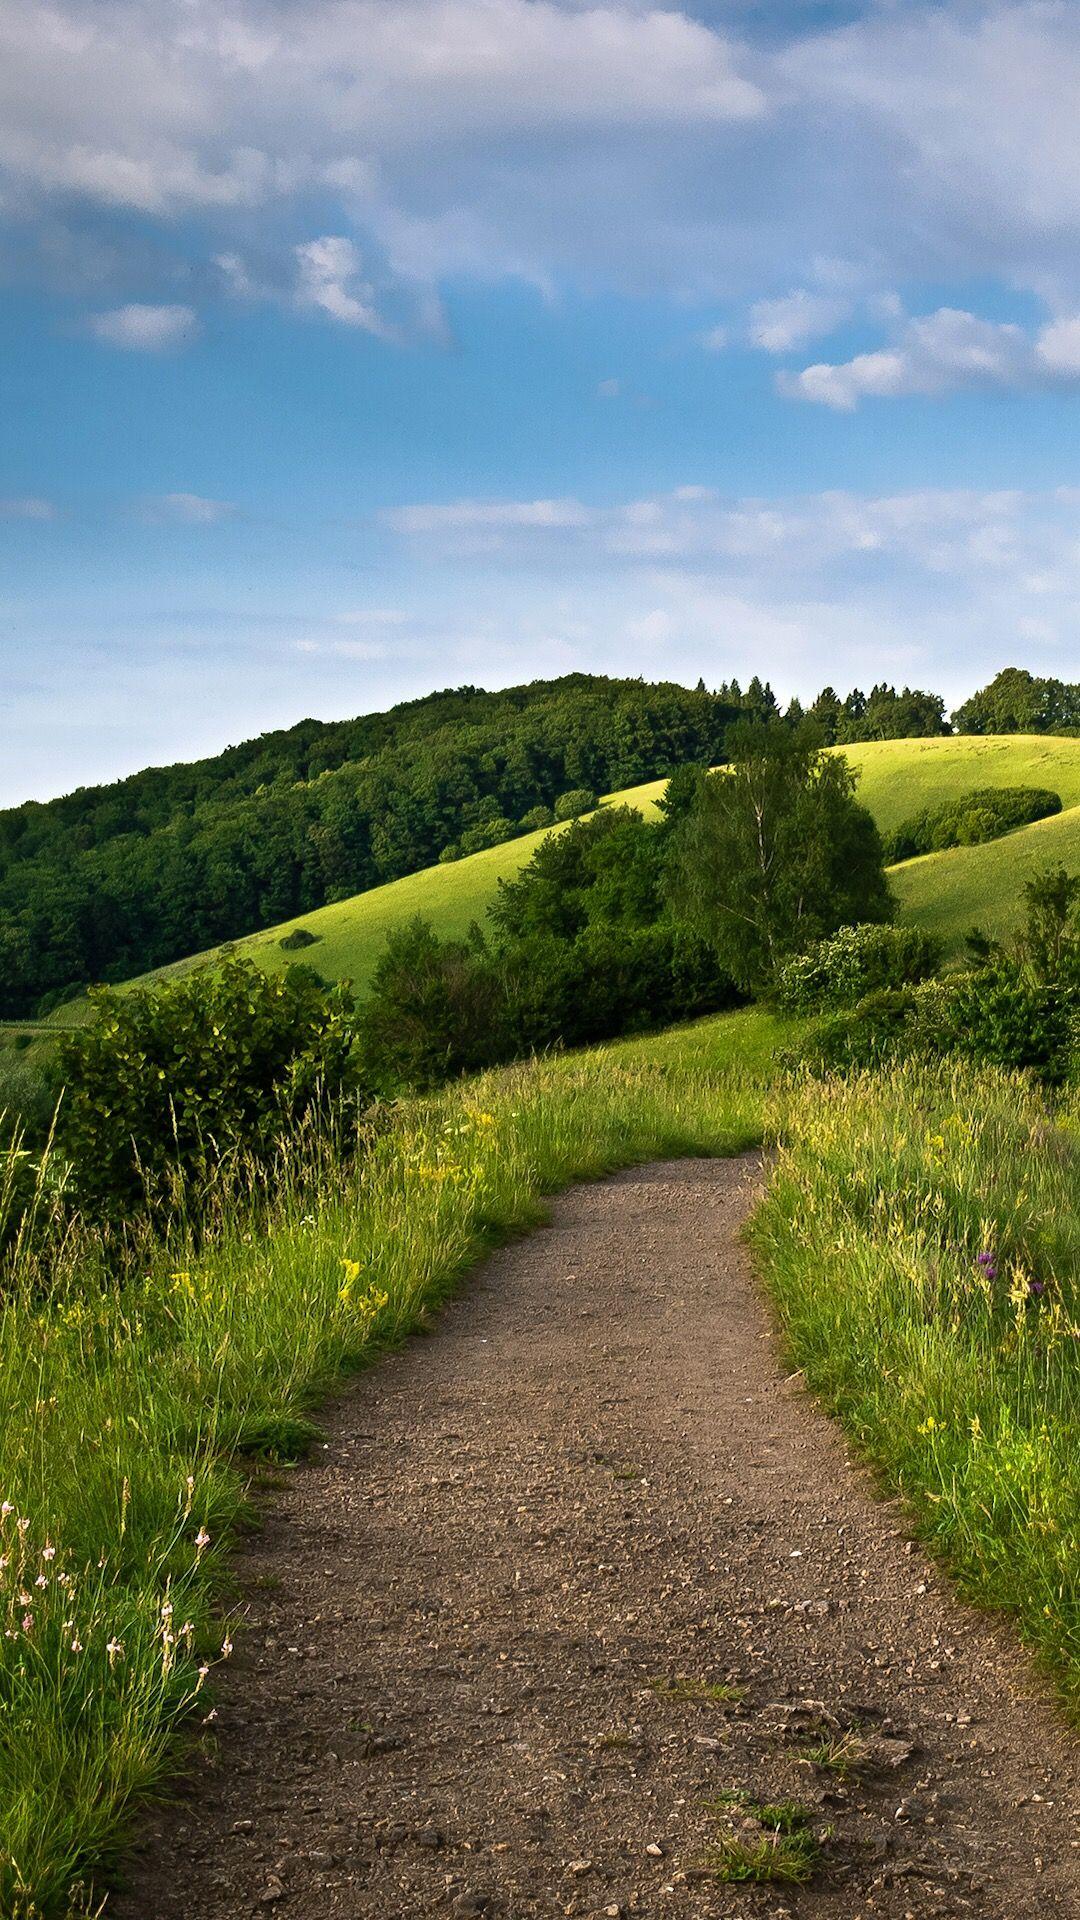 Trail in the hillside